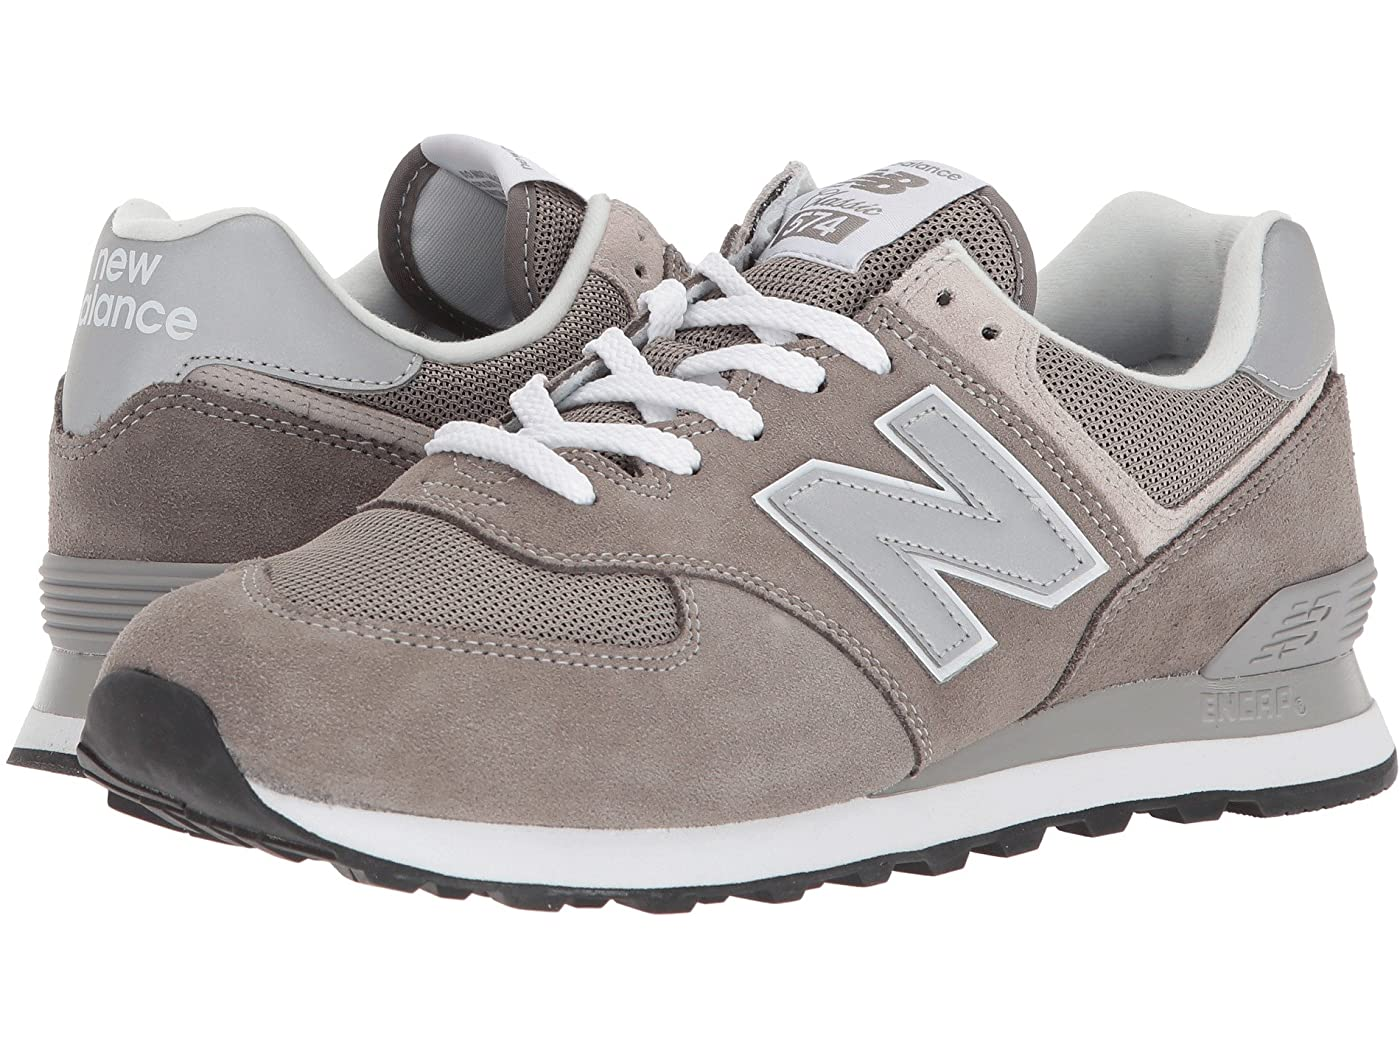 ML574v2 by New Balance, available on zappos.com for $79.95 Emily Ratajkowski Shoes Exact Product